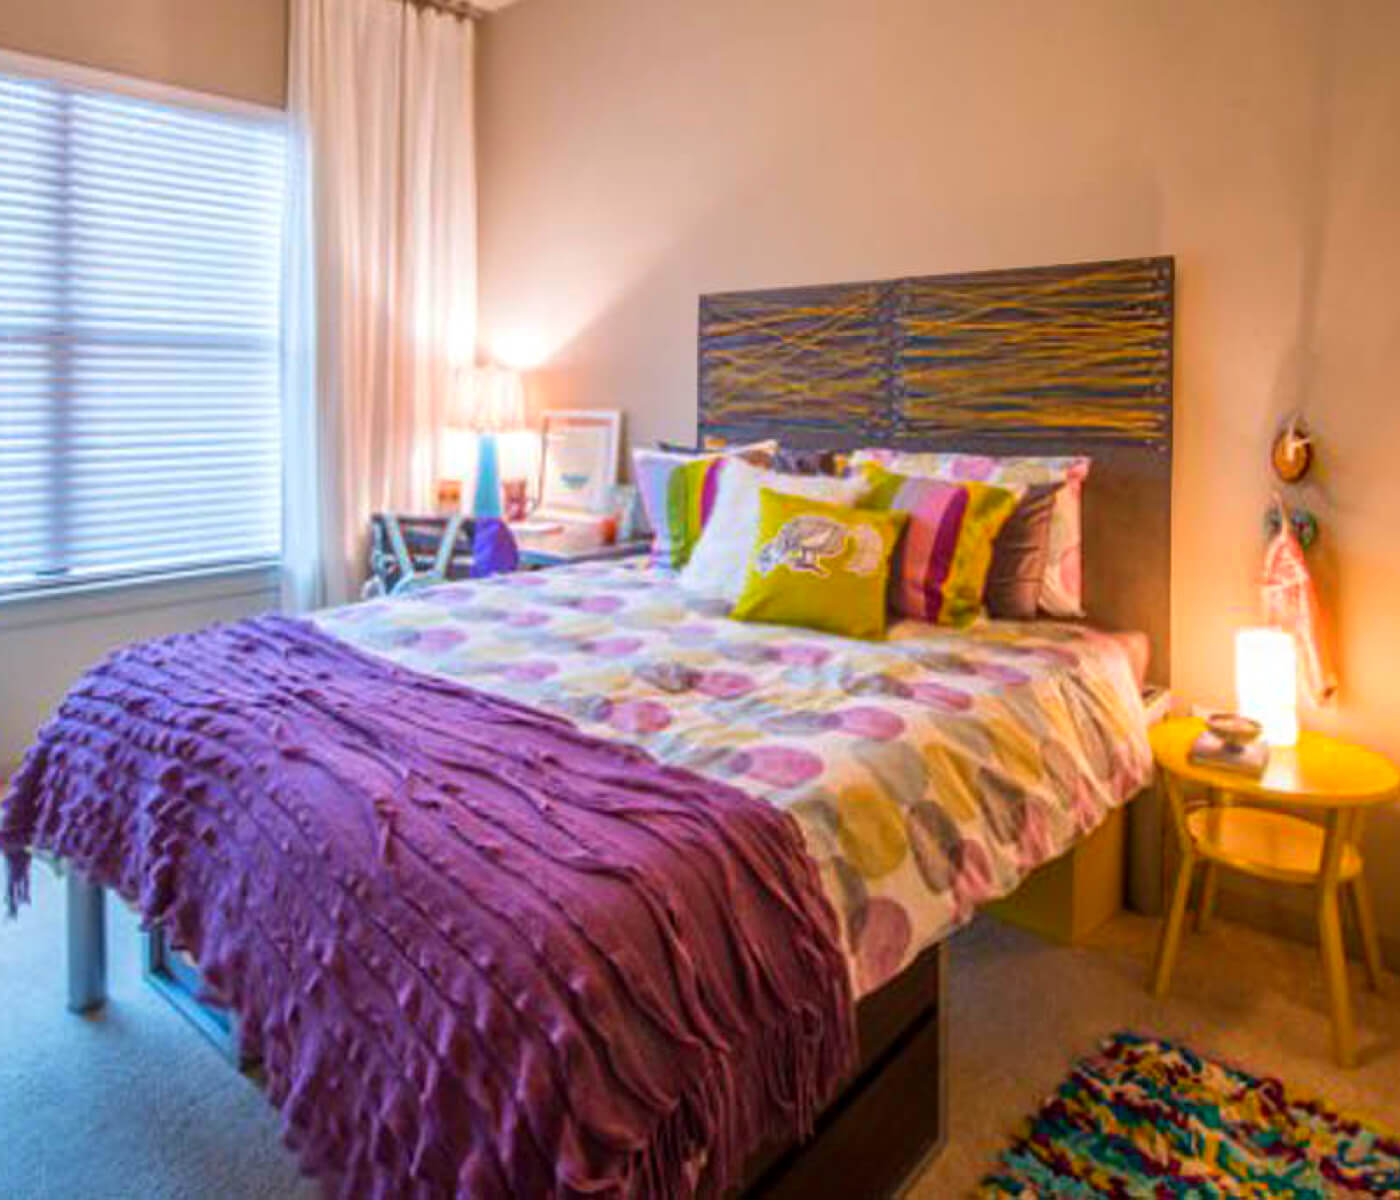 Loft-Vue-off-campus-student-housing-apts-bedroom